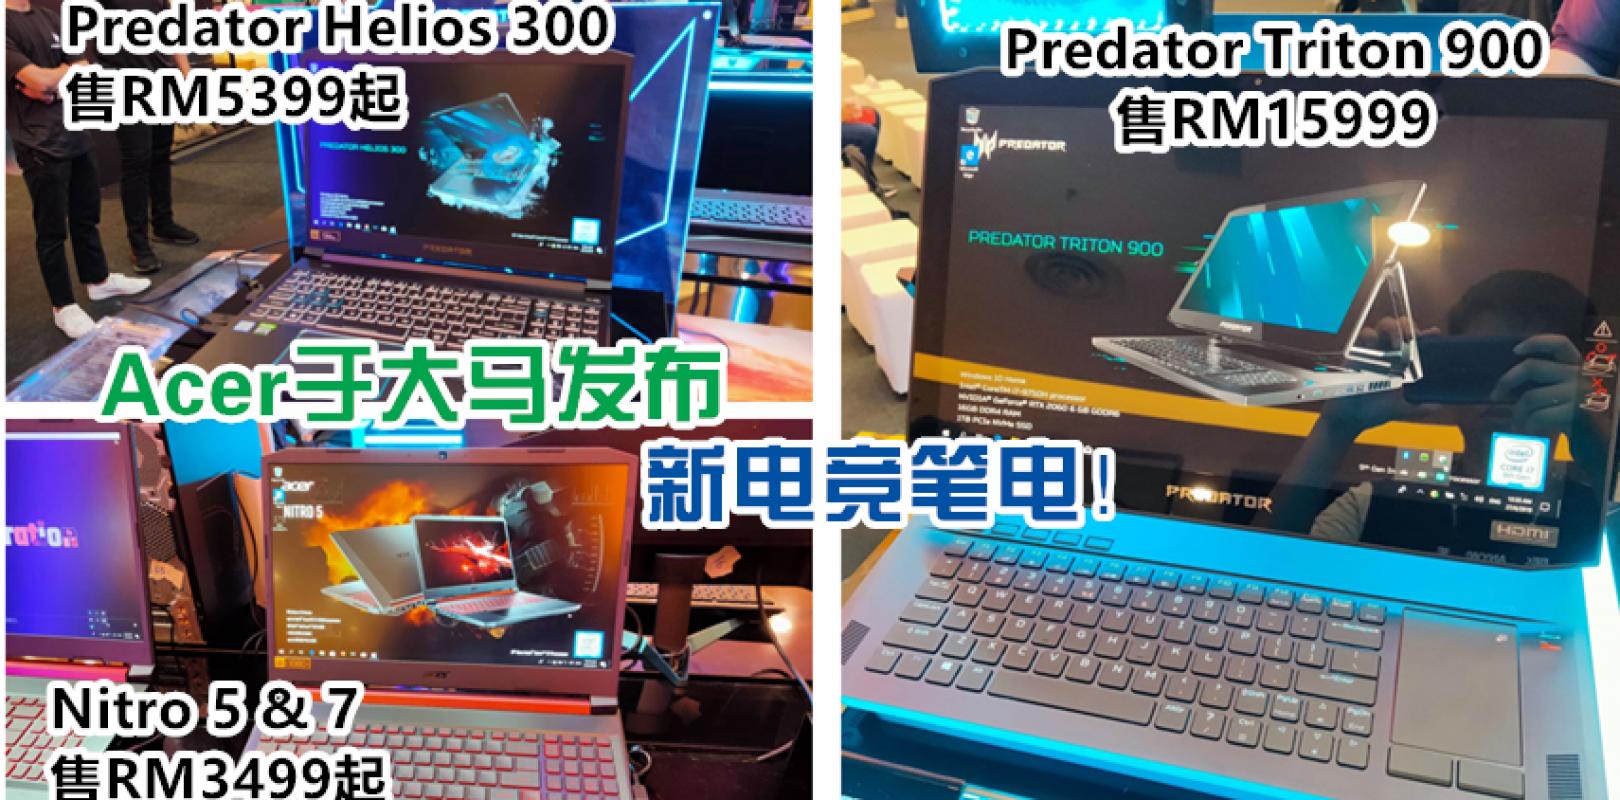 Acer于大马发布屏幕可随意折翻的Predator Triton 900、Predator